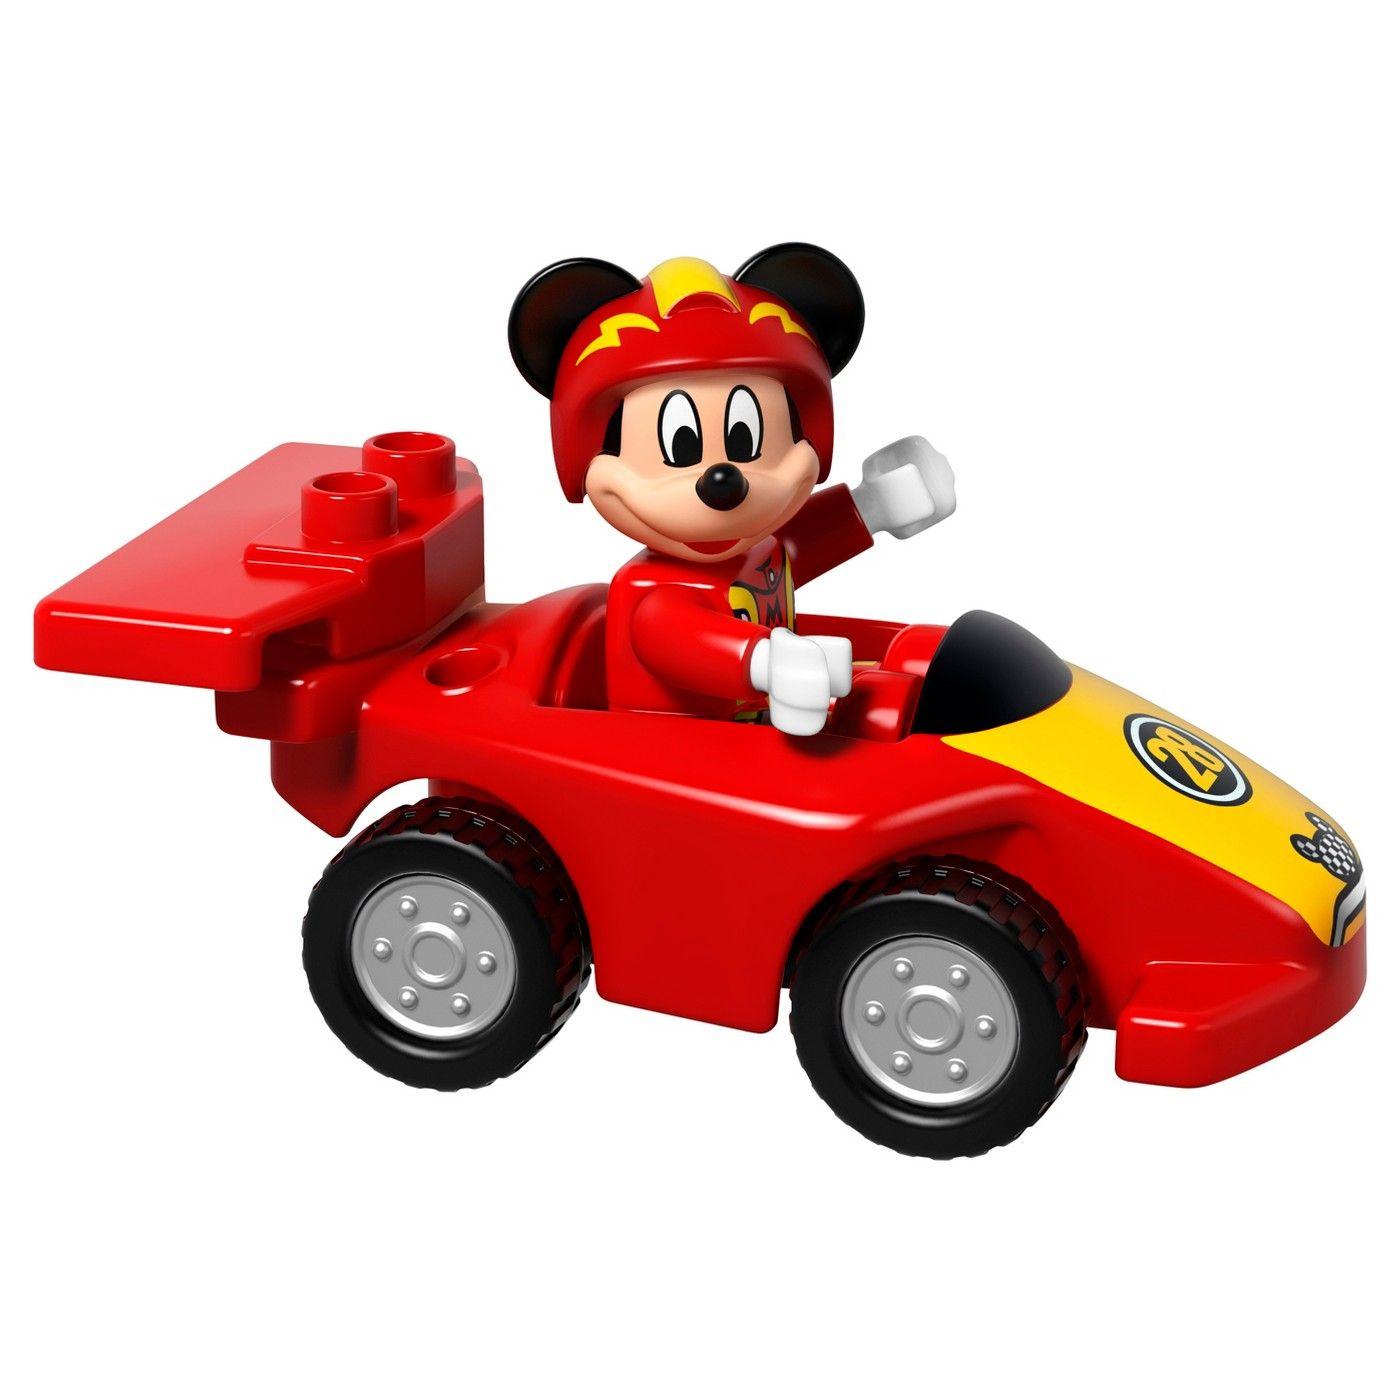 Legoâ Duploâ Disneyâ20mickey Racer 10843 Disney Duplo Lego